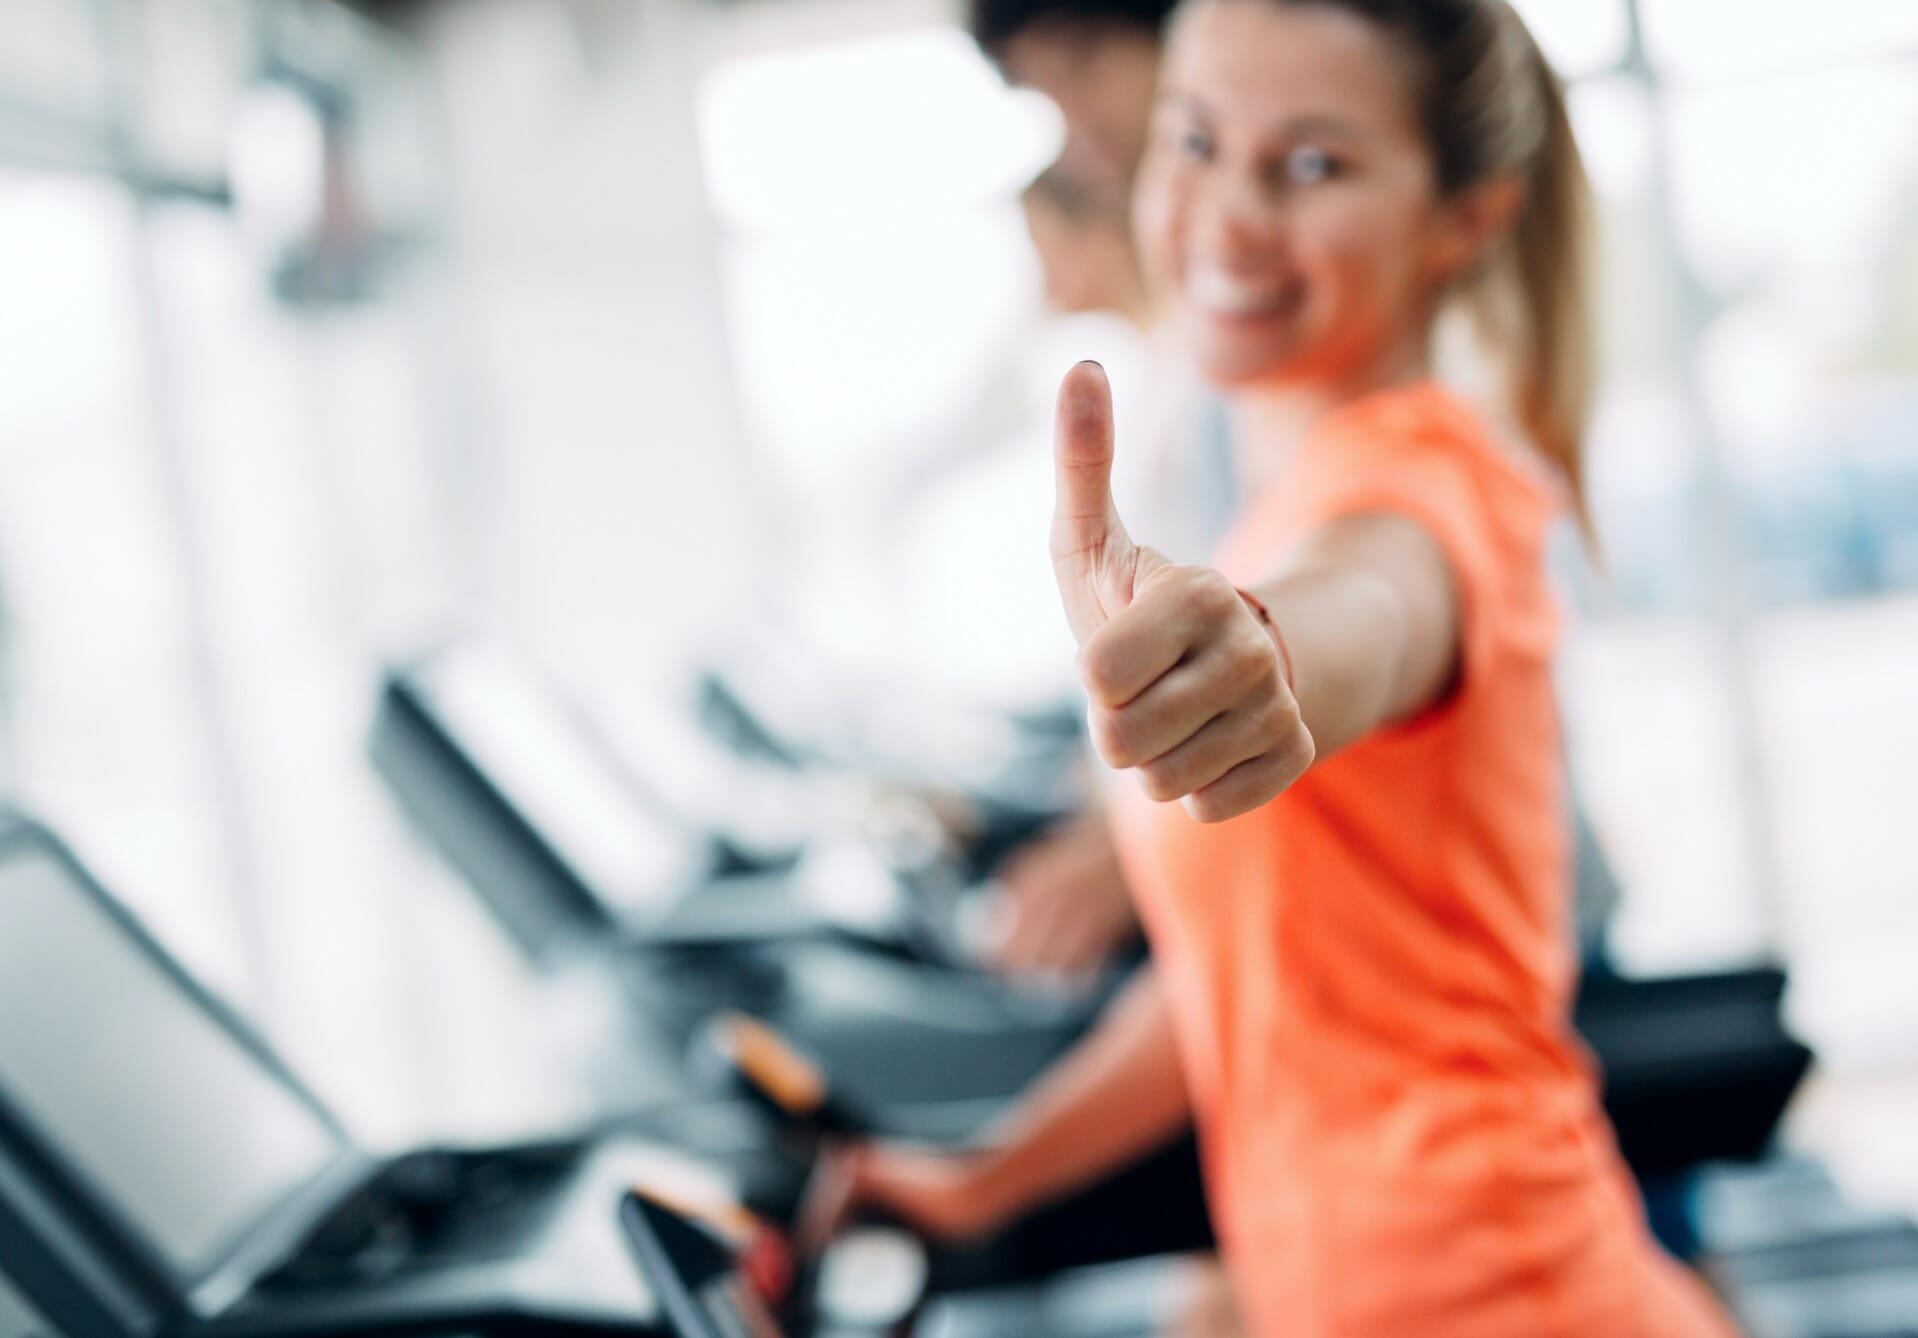 lifespan fitness tr4000i folding treadmill review